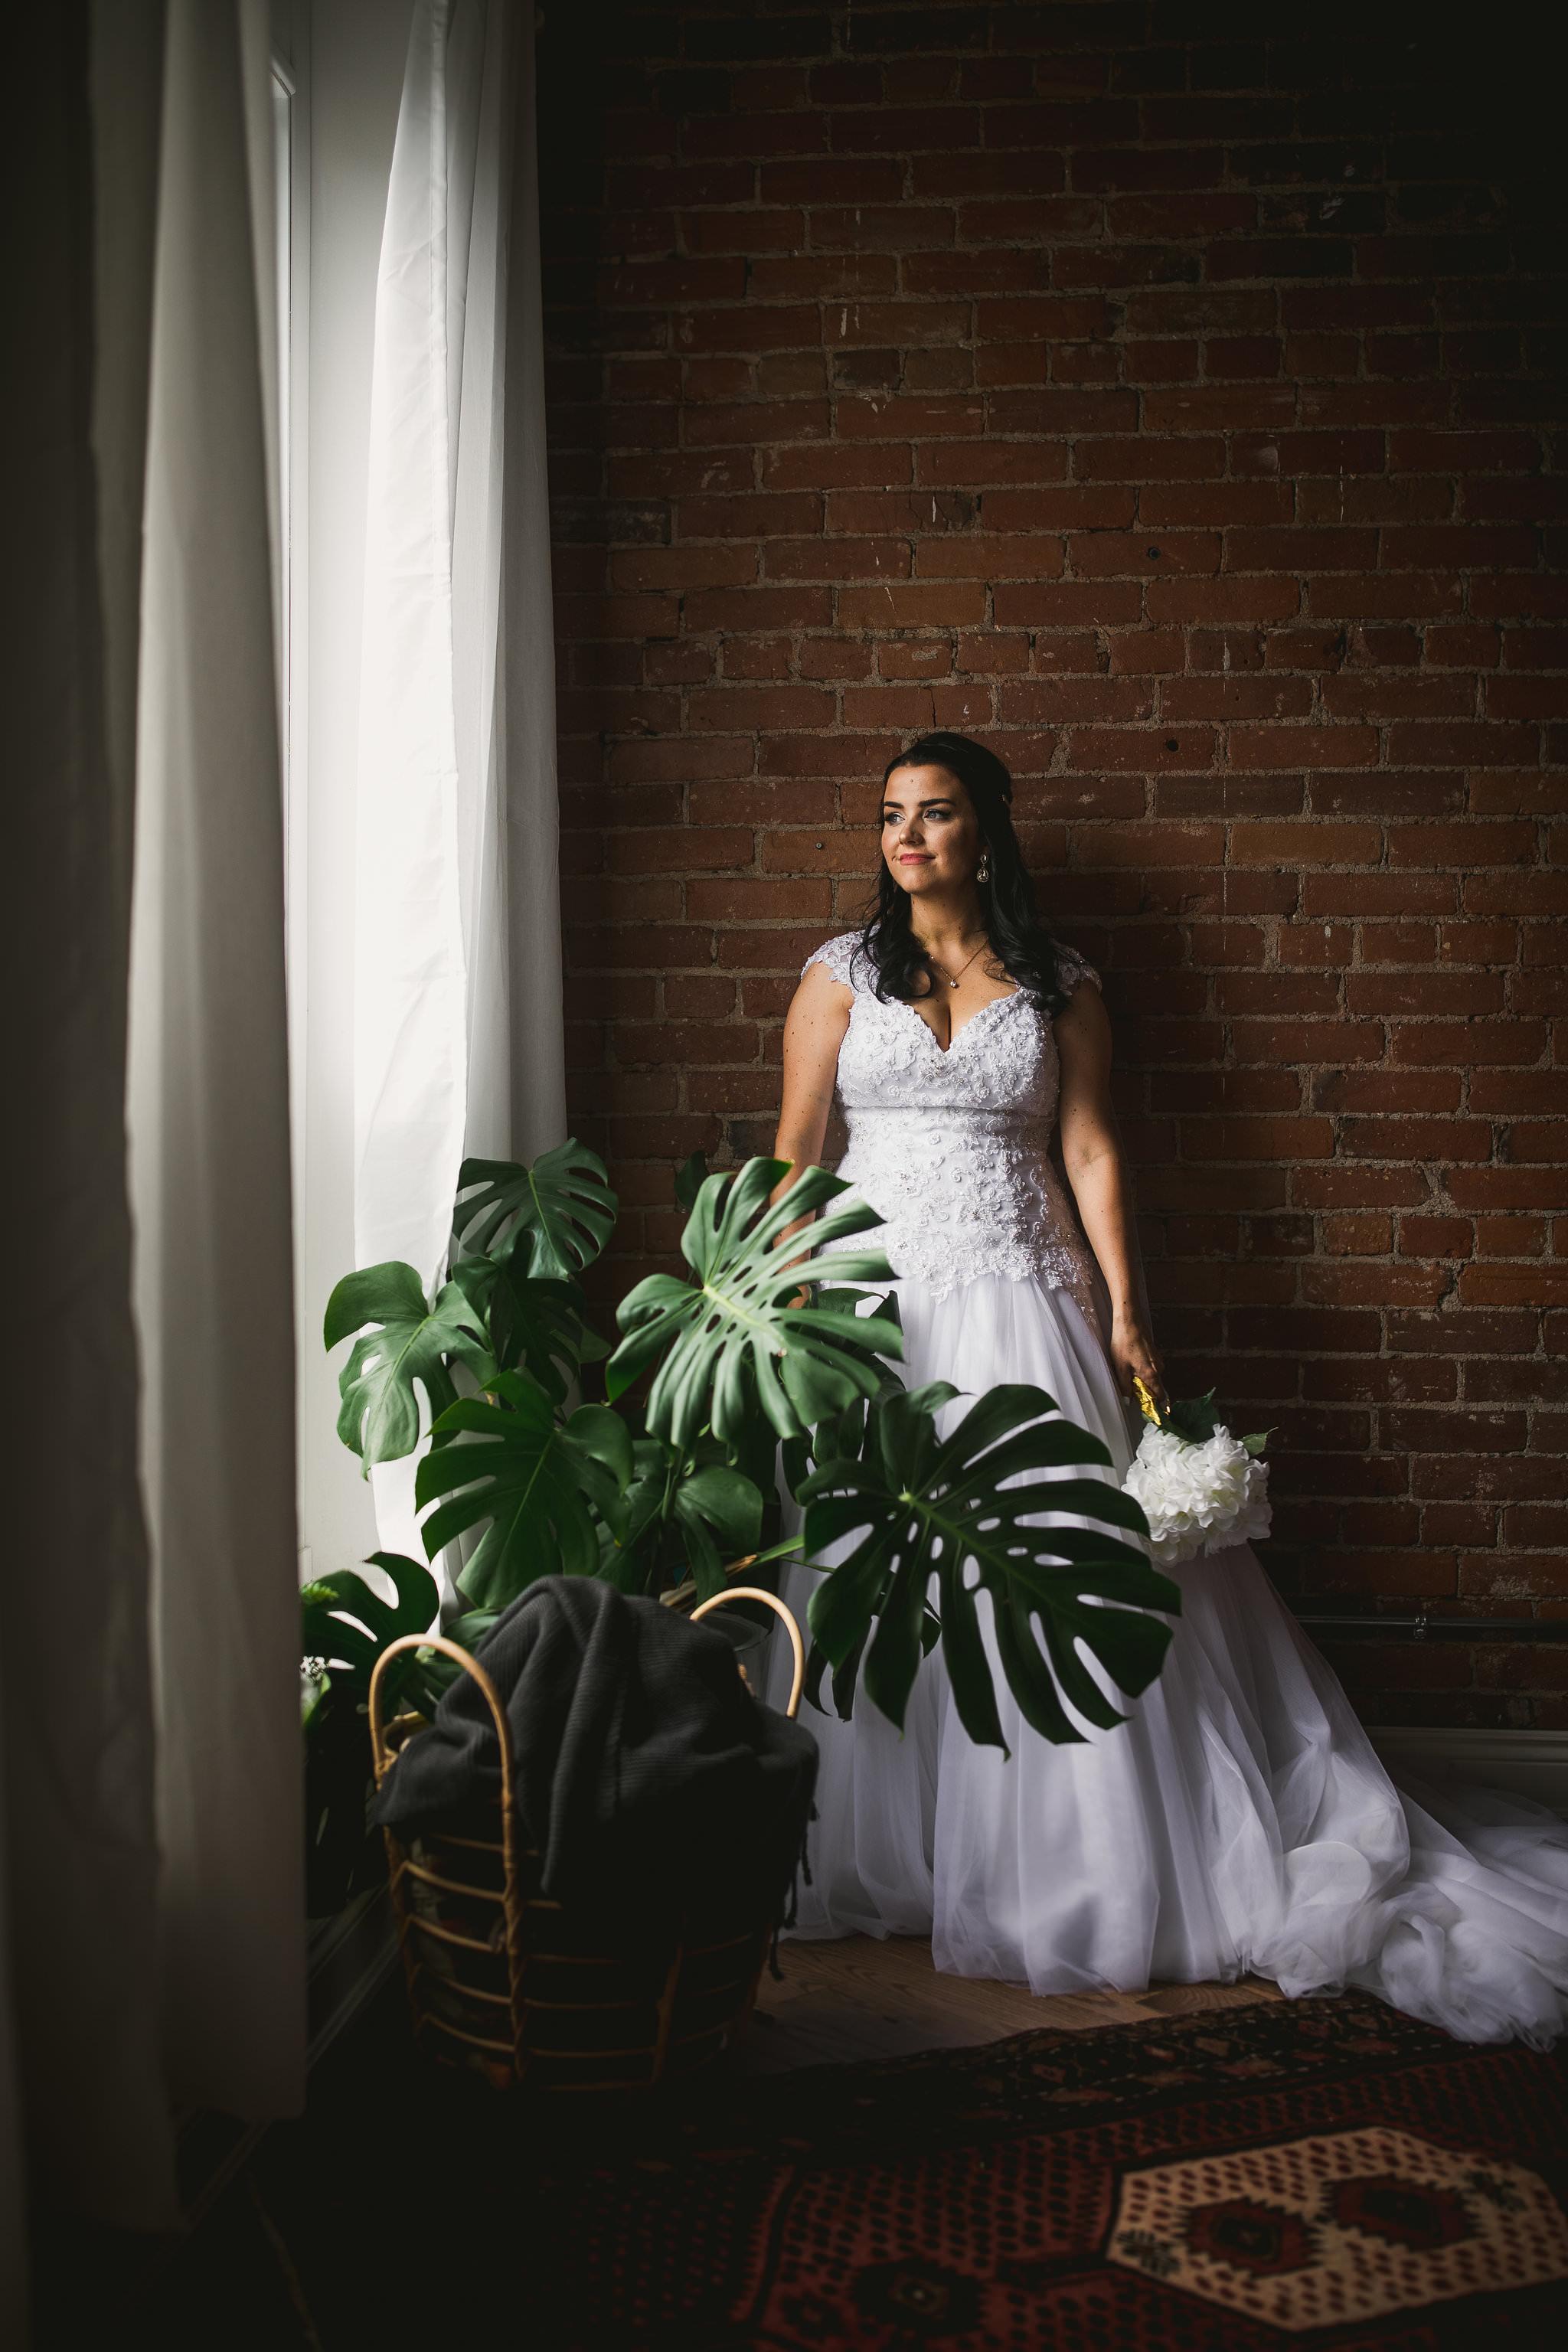 Kristen Adam Kindred Loft Whitby Wedding Photos 281 - Durham Wedding Photographer: Kindred Loft Wedding Photos